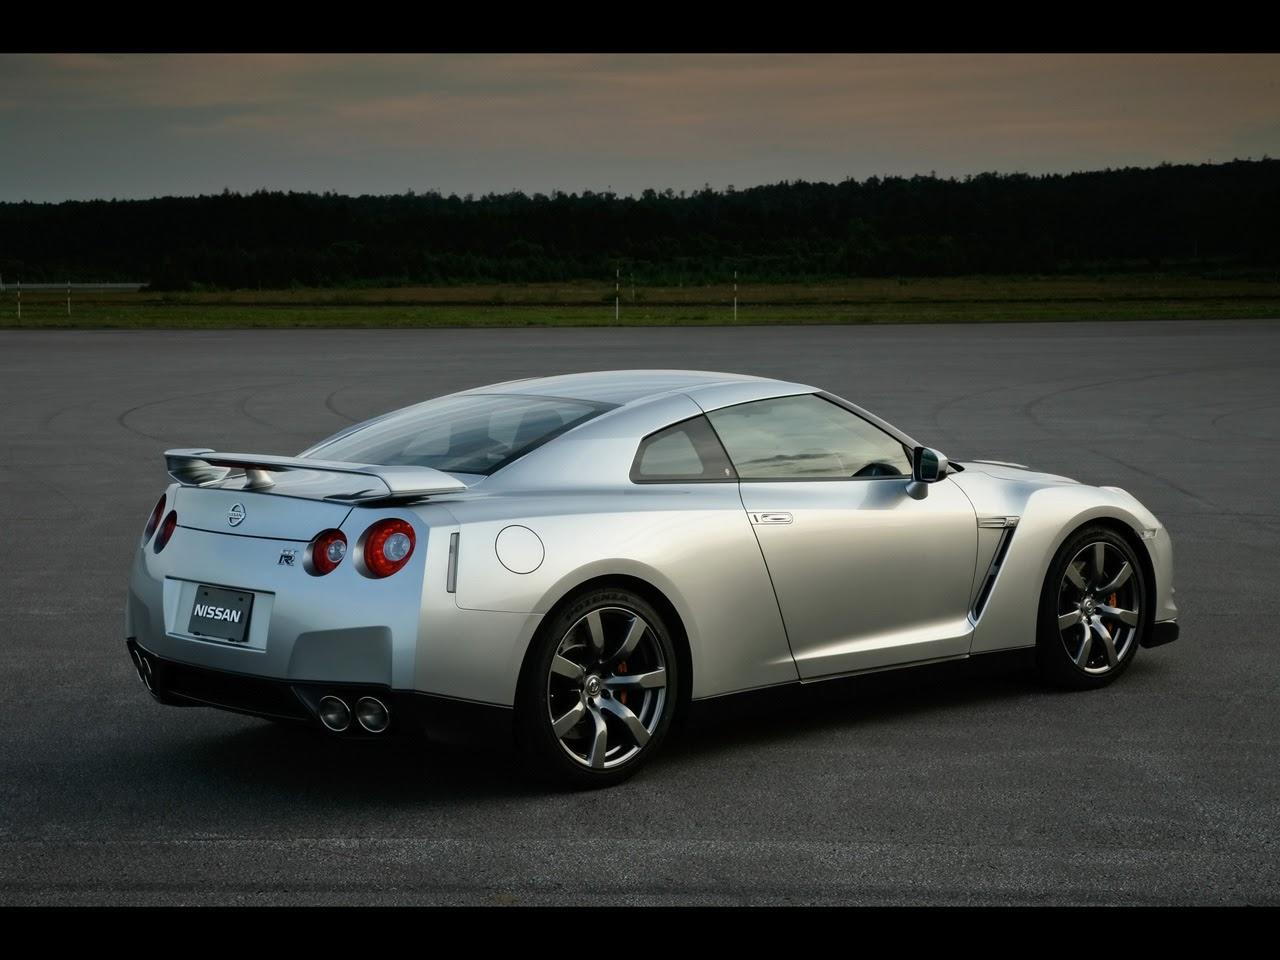 2008 Nissan GTR